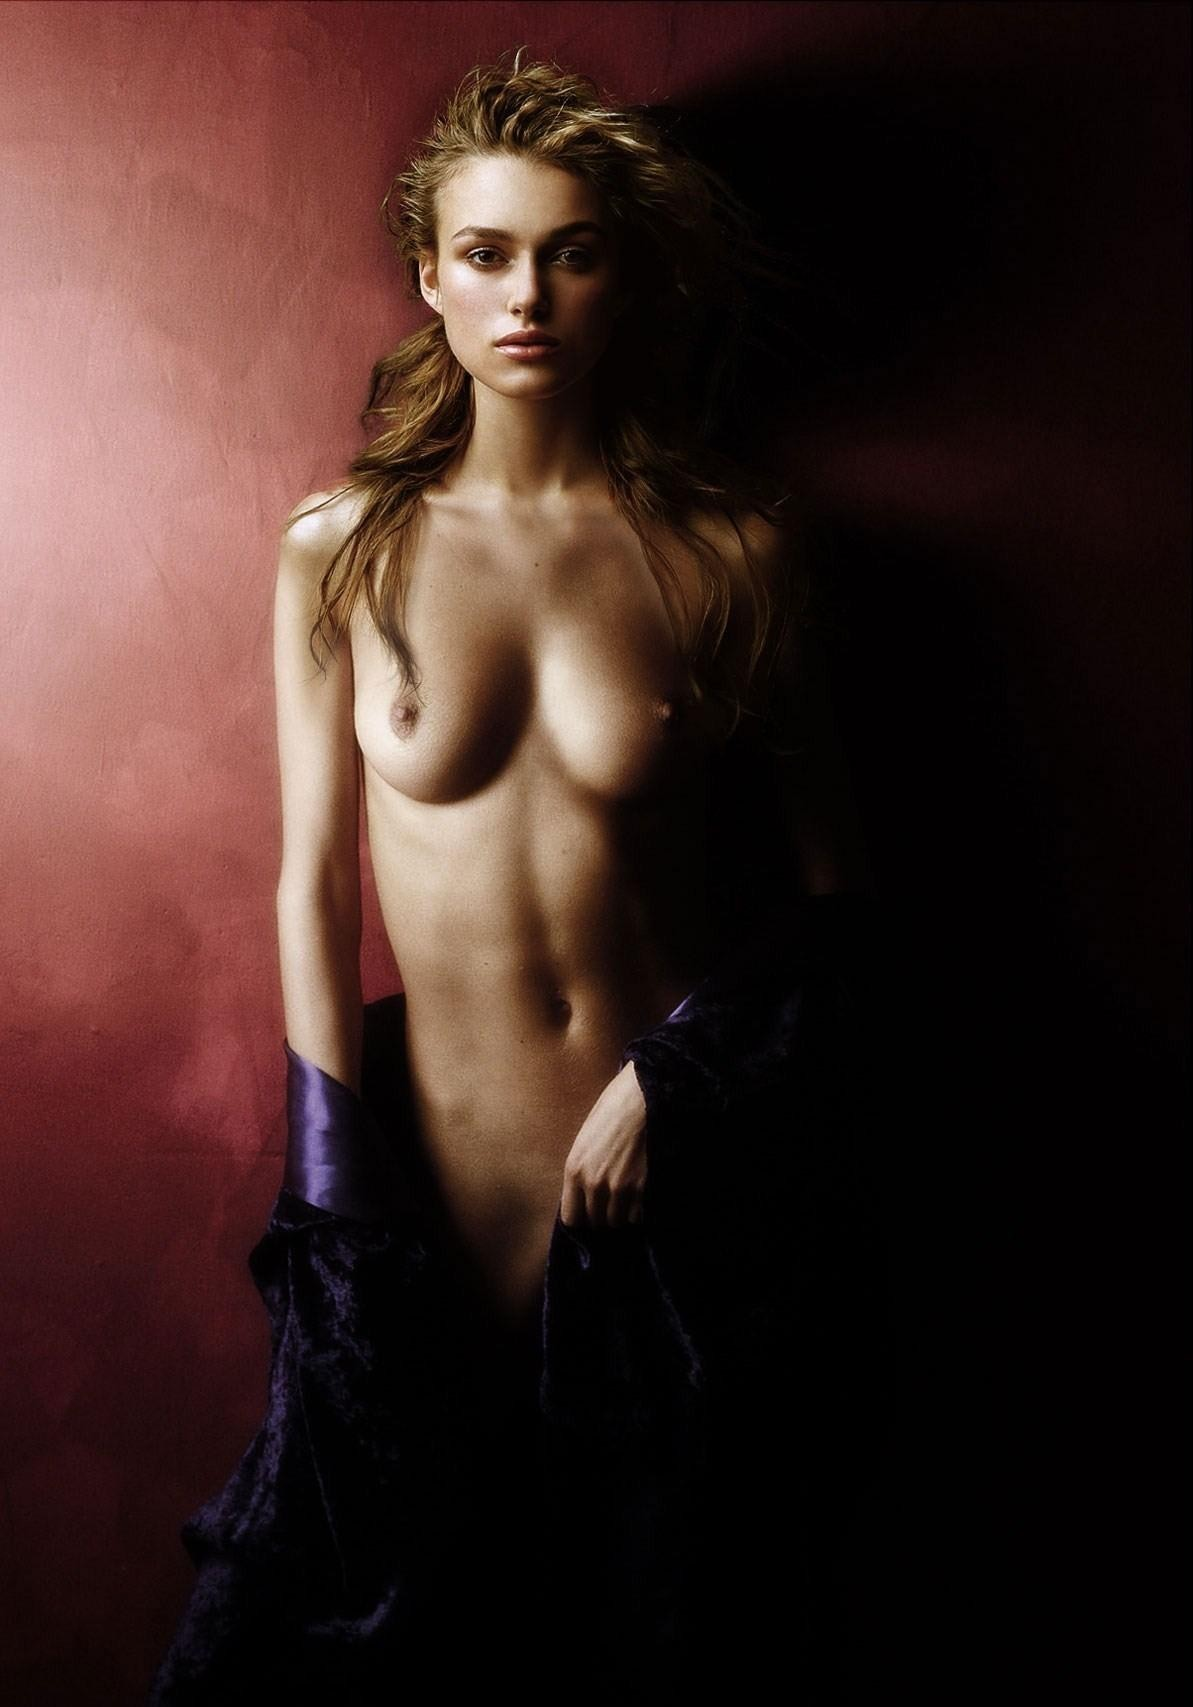 keira knightley sexy uncensored